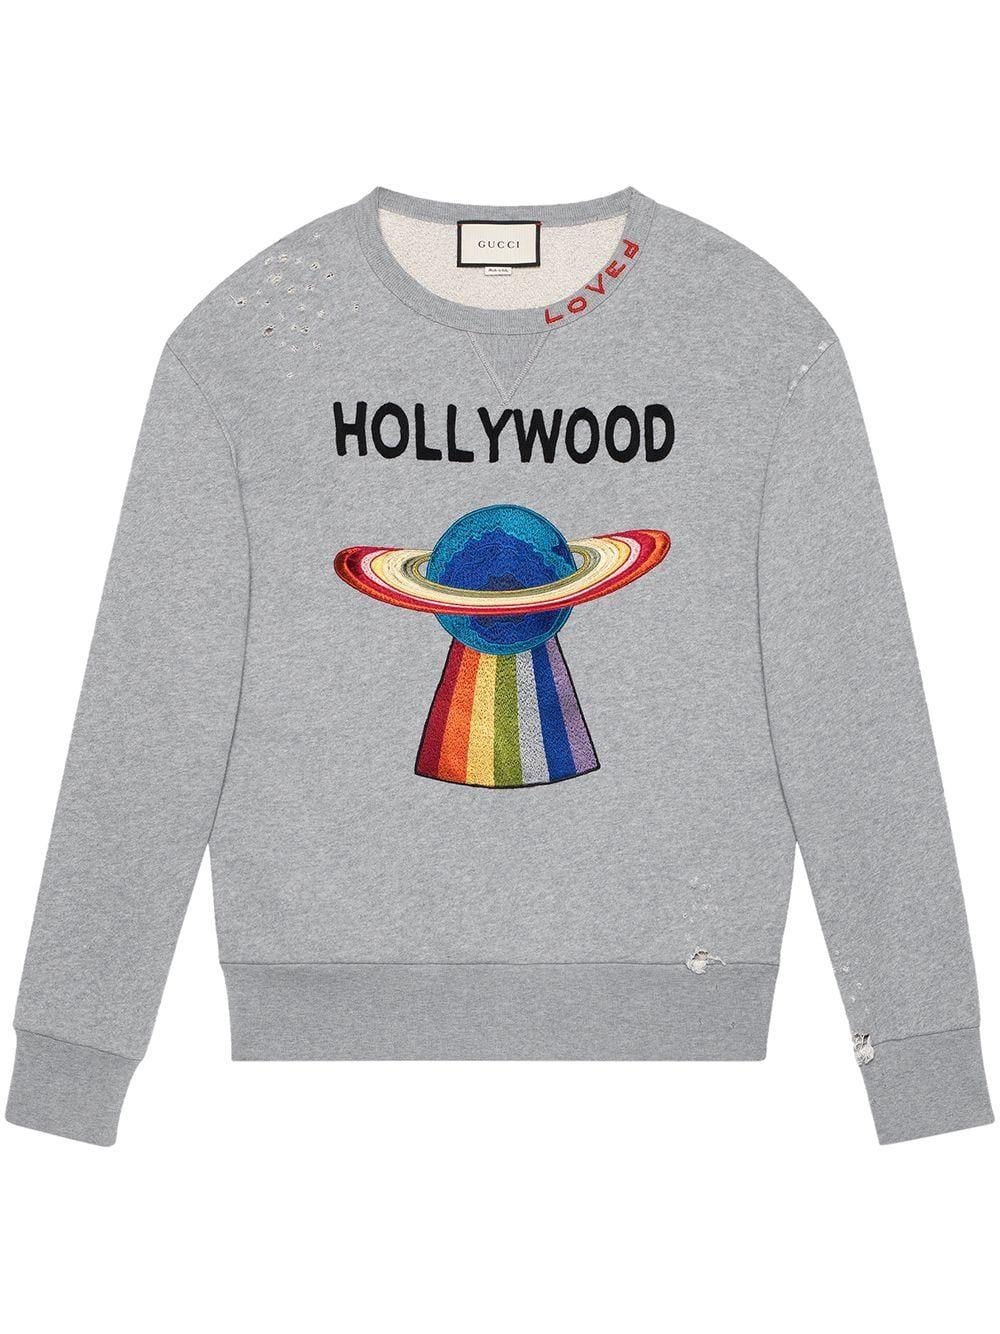 Gucci Cotton Sweatshirt With Planet Farfetch Mens Designer Hoodies Sweatshirts Hoodies Men [ 1334 x 1000 Pixel ]